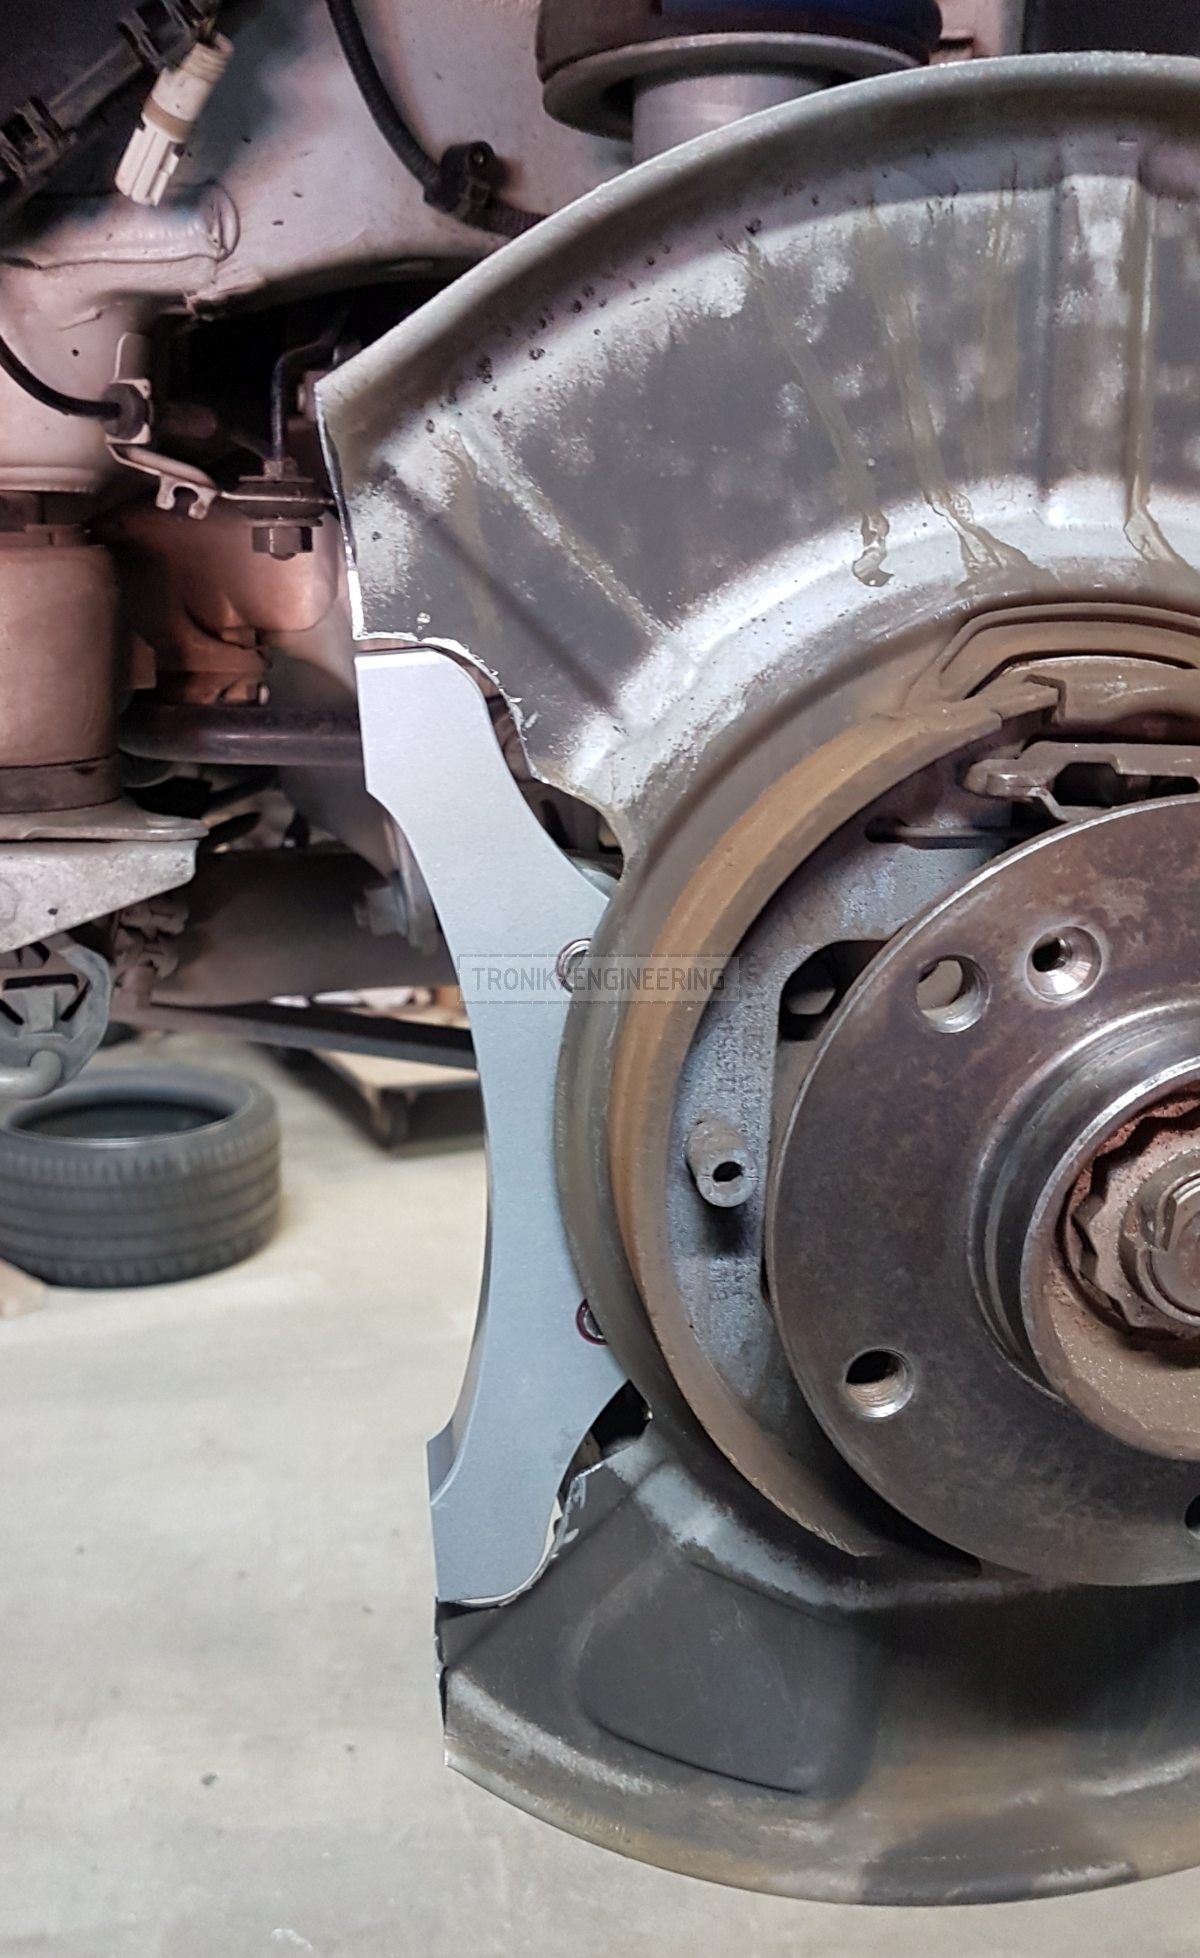 rear axle caliper adapter installed